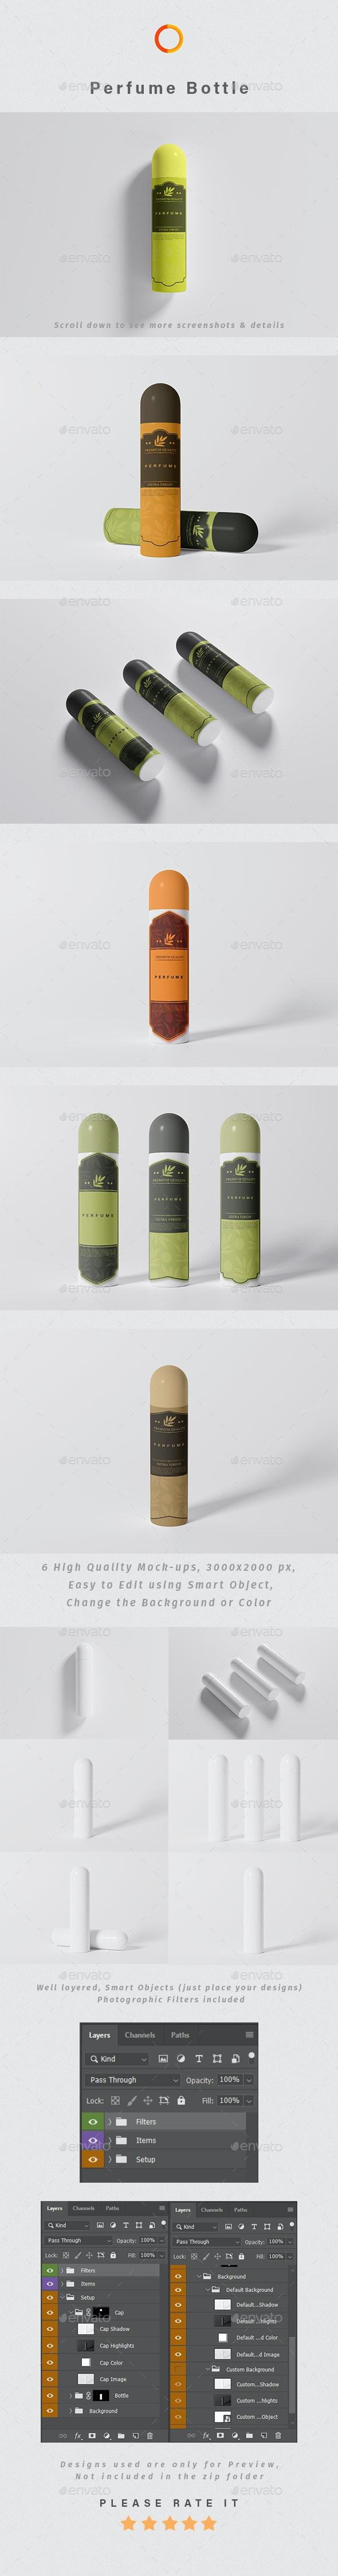 Perfume Bottle Photoshop Mock-up - Packaging Product Mock-Ups